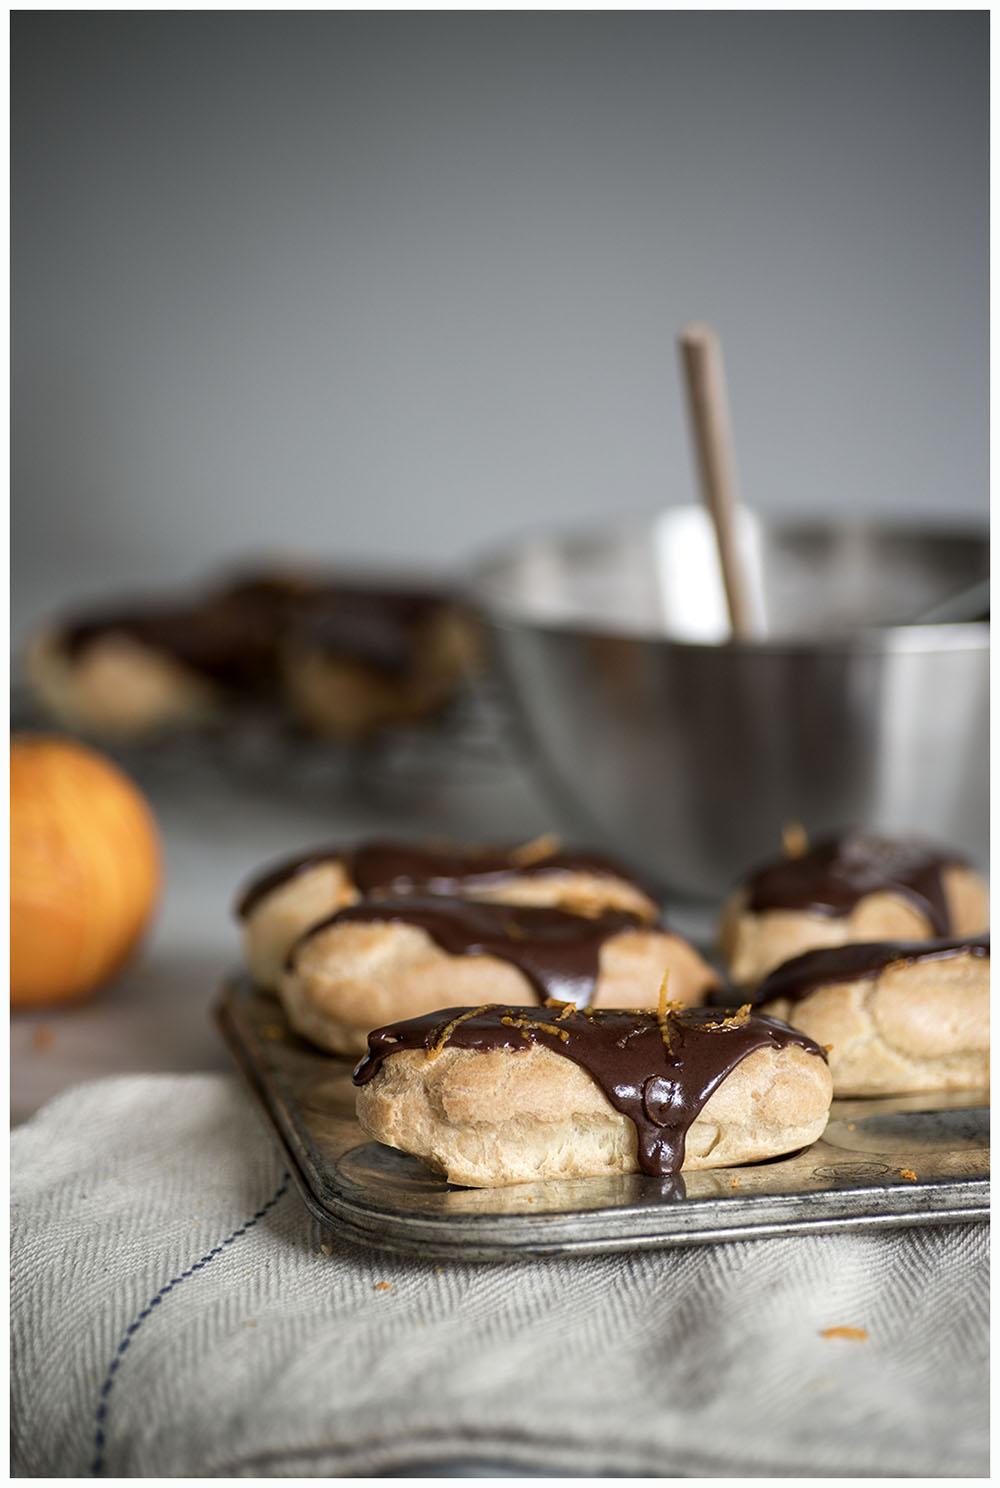 Orange and dark chocolate éclairs